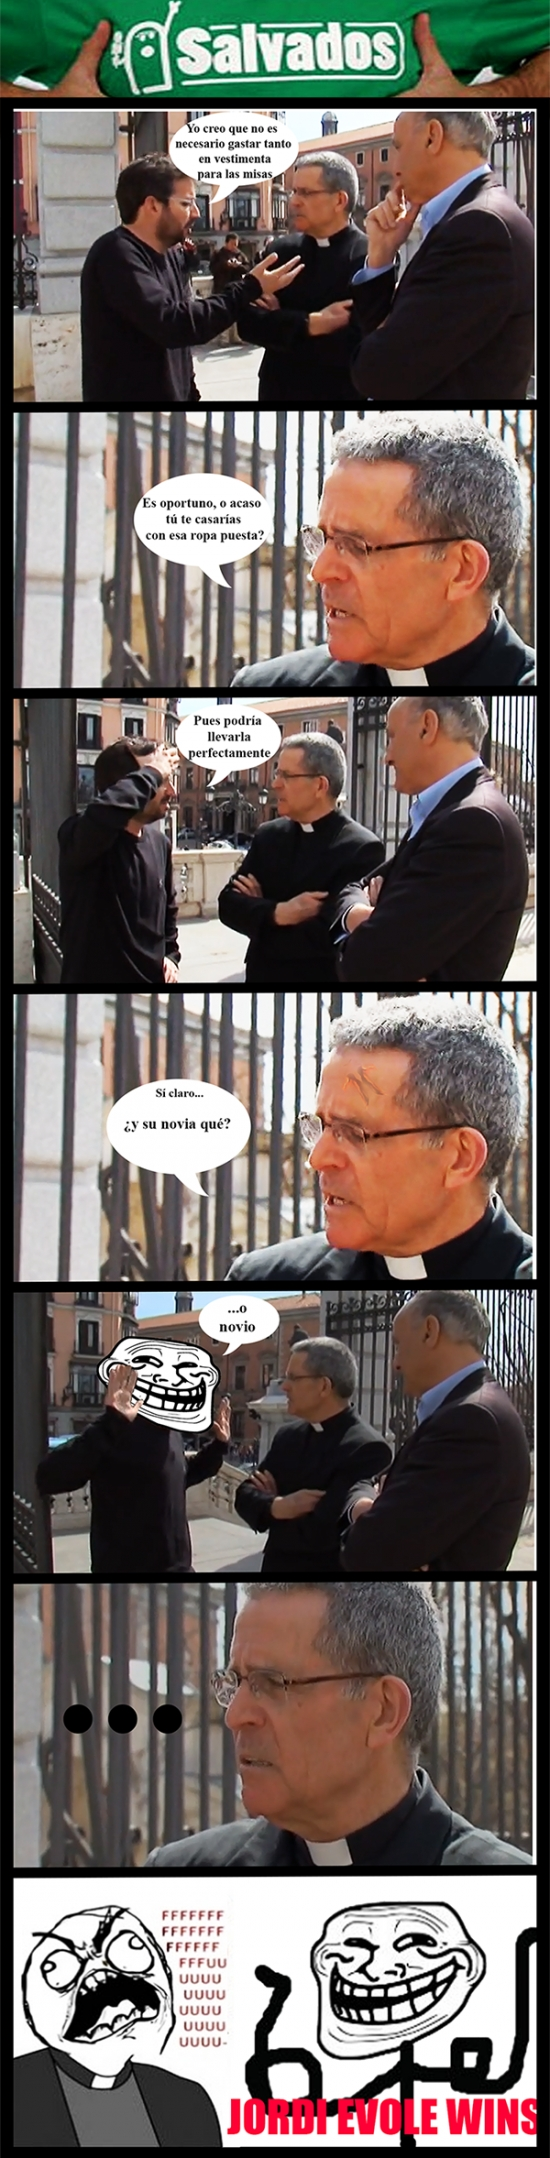 ffffuuuu,iglesia,Jordi Evole,salvados,troll